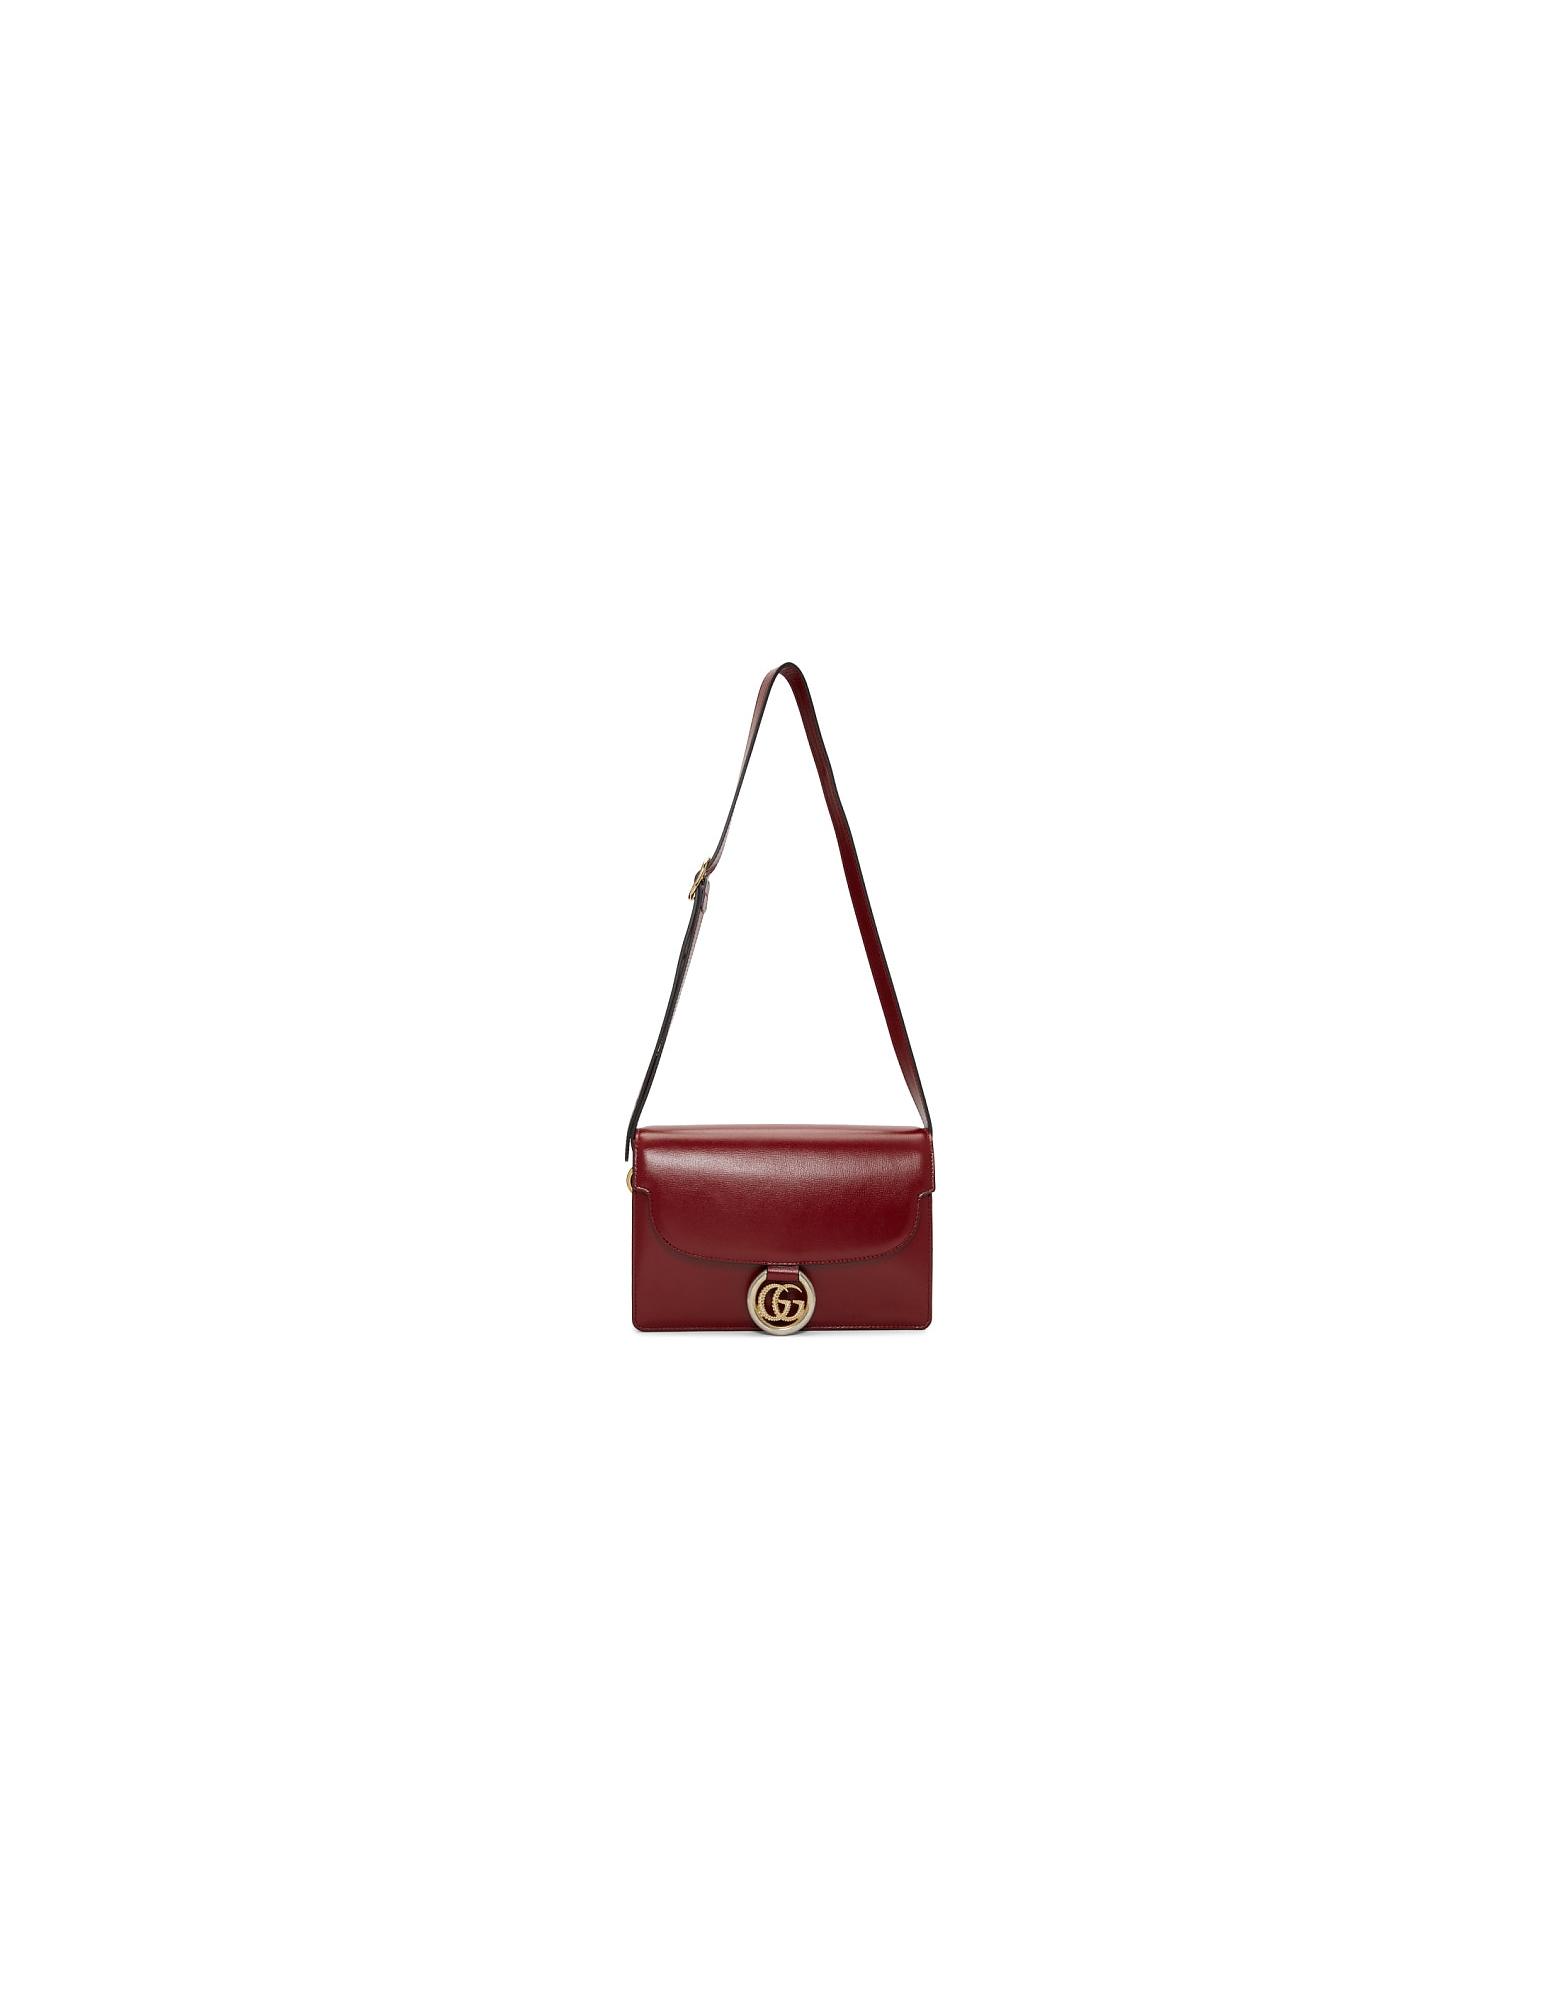 Gucci Designer Handbags, Red Small GG Ring Shoulder Bag